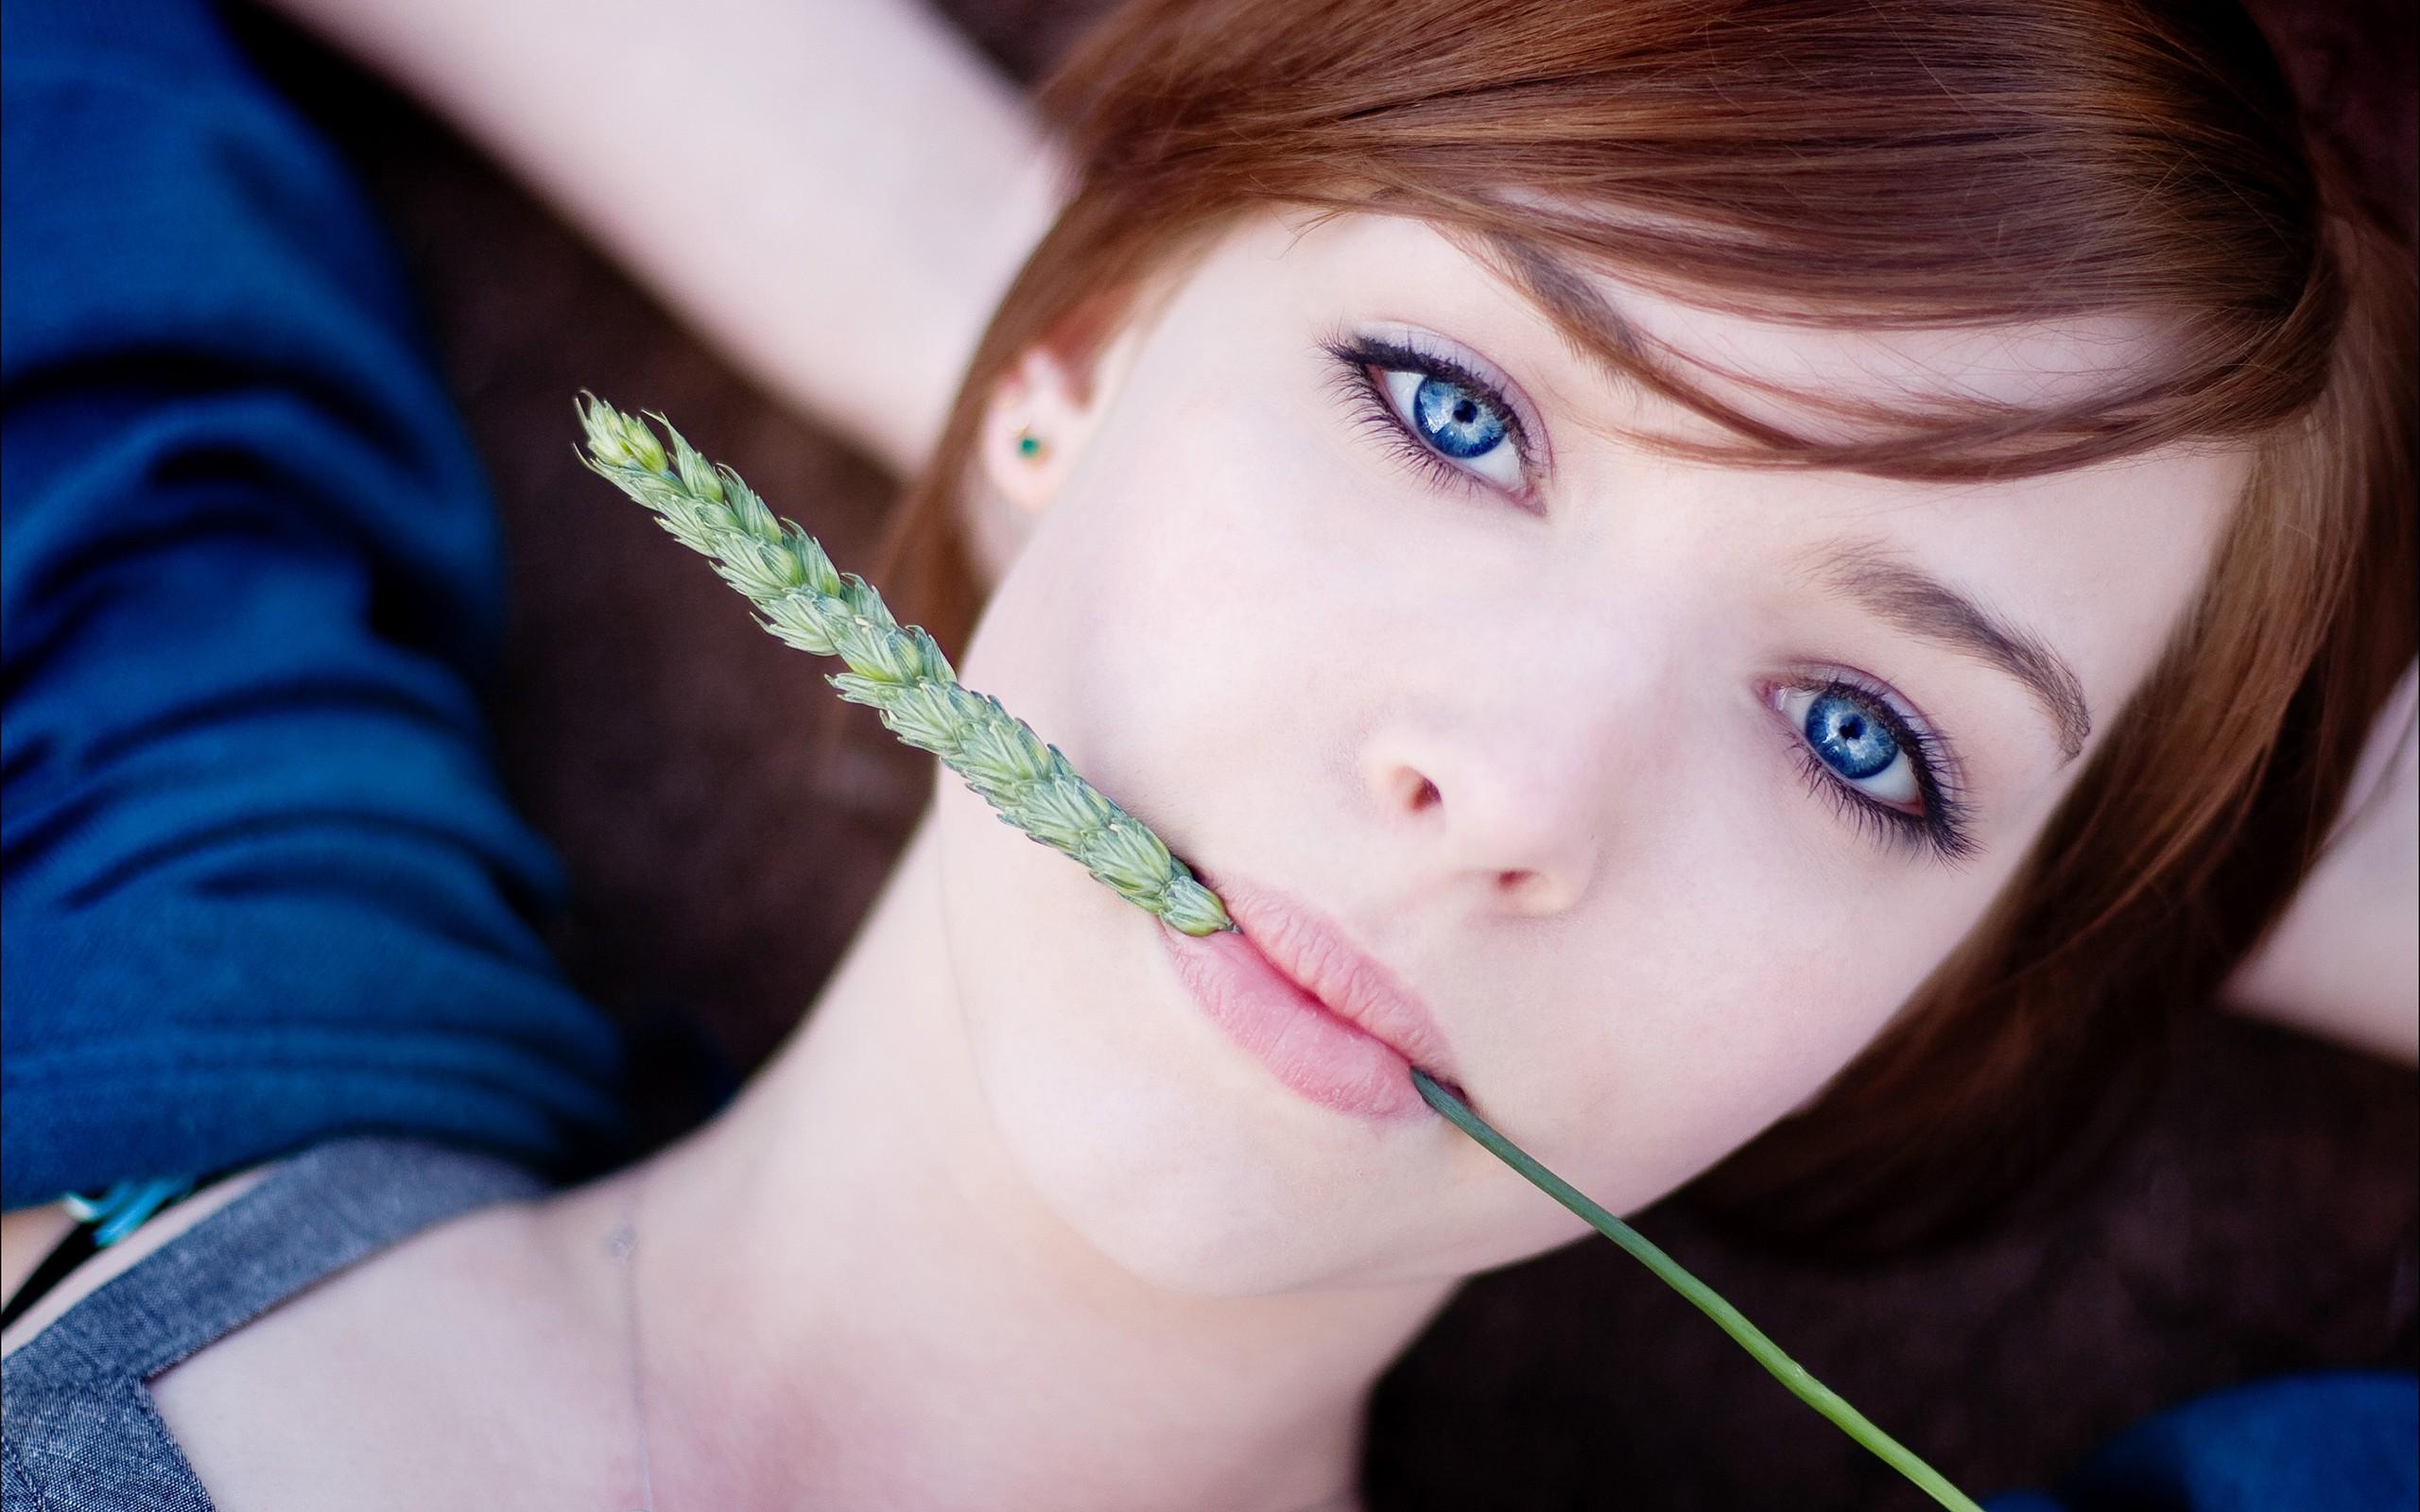 Pelirroja de ojos azules - 2560x1600